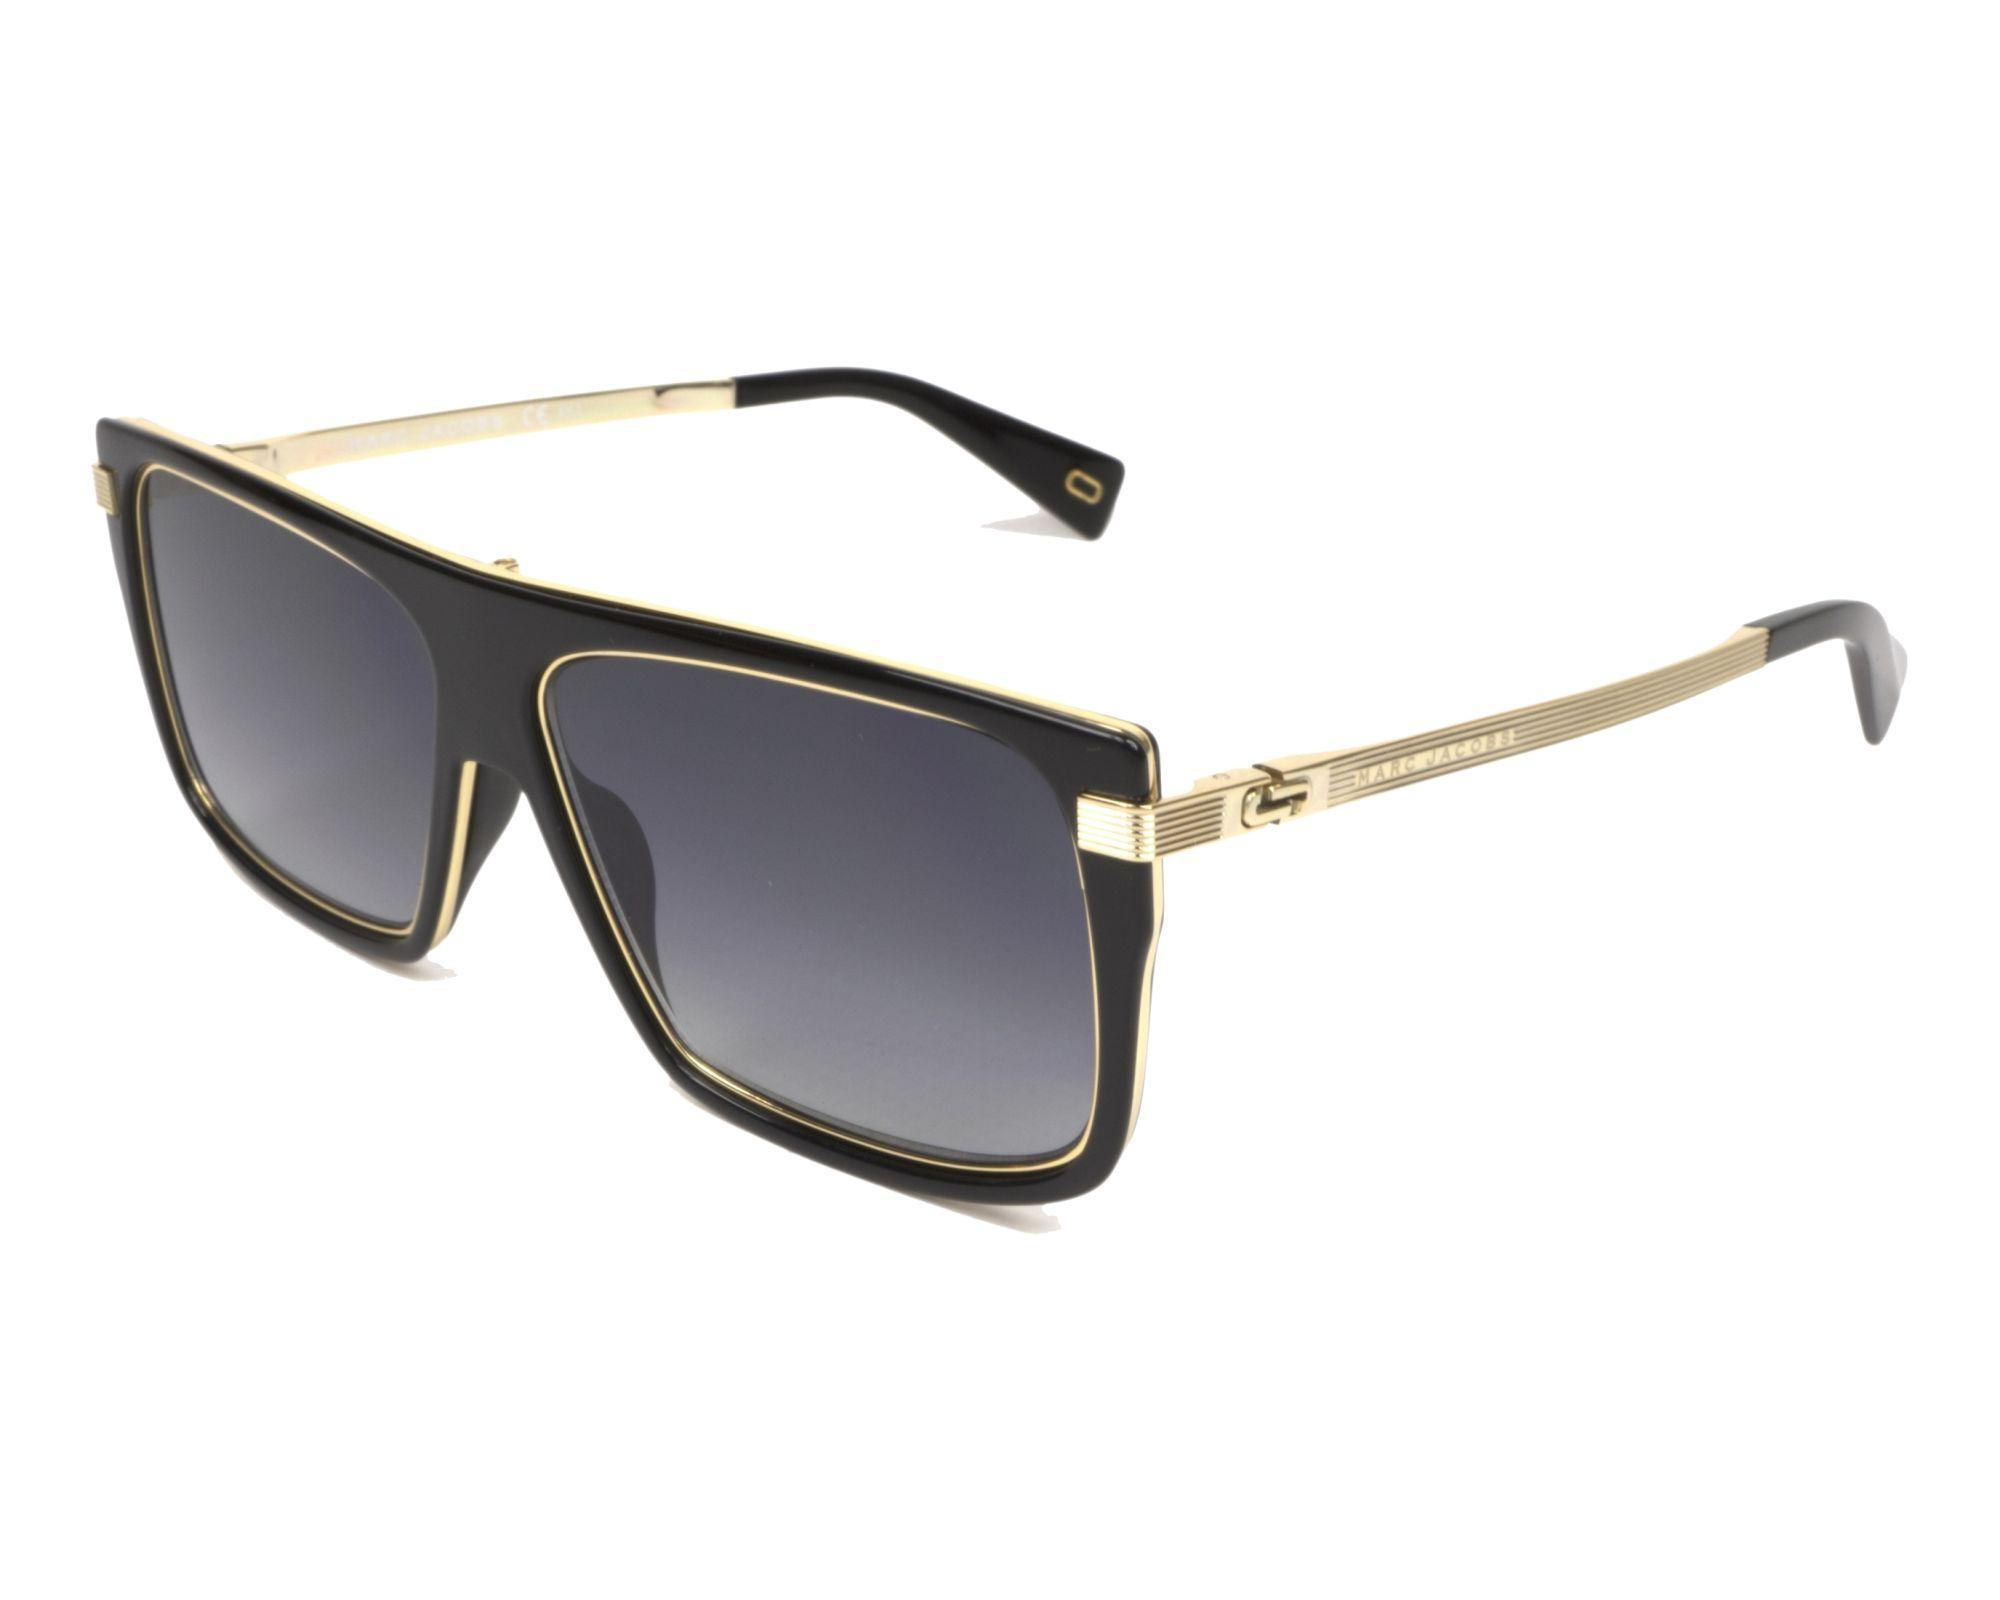 a2bdebe7846 Sunglasses Marc Jacobs MARC-242-S 2M2 9O 59-14 Black Gold